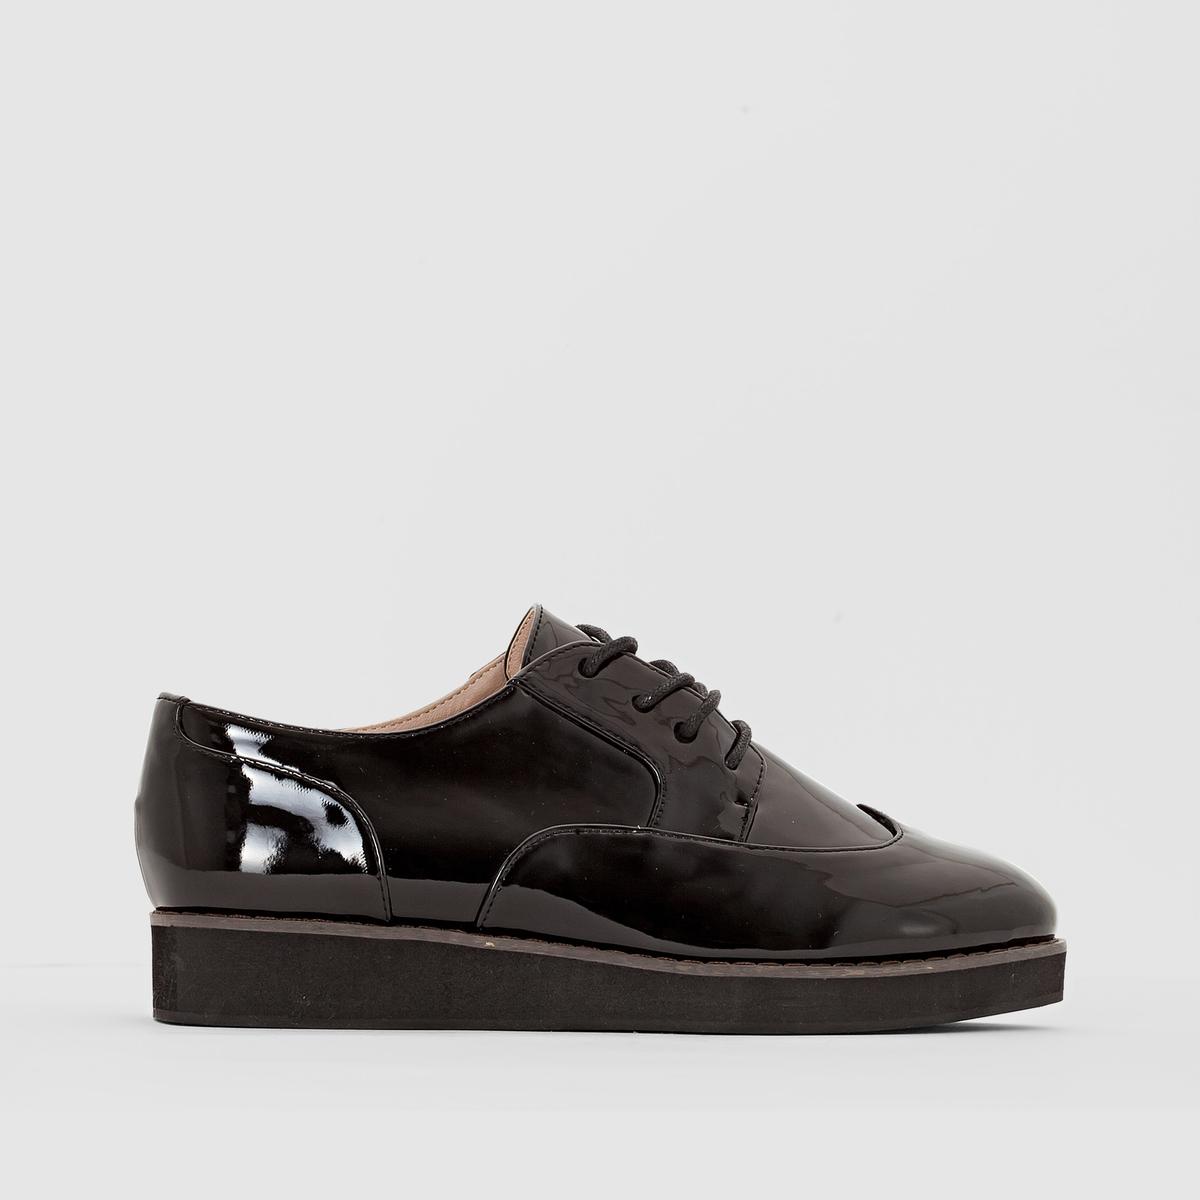 Ботинки-дерби синтетические, размер 38-45 ботинки дерби под кожу питона